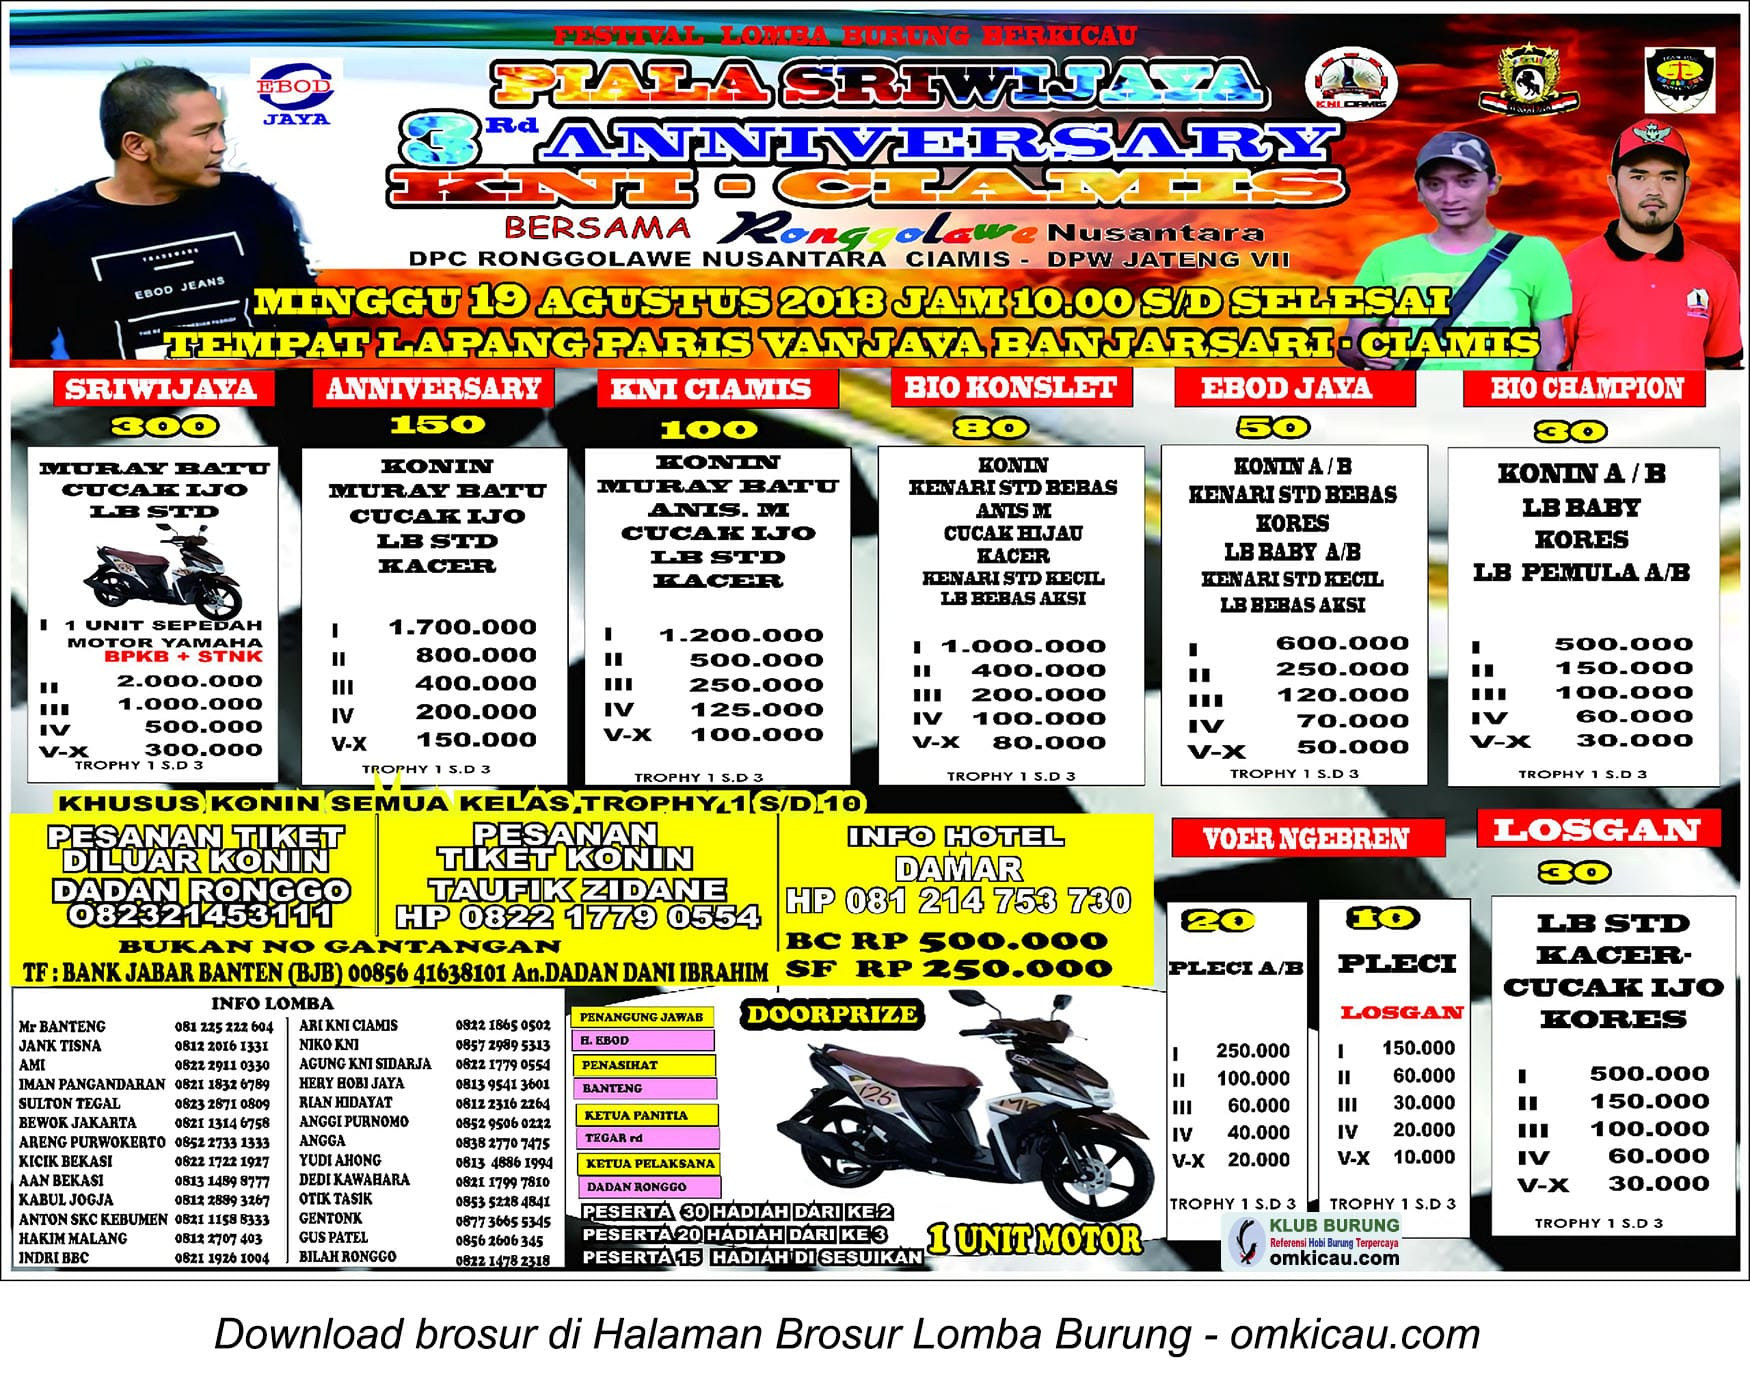 Piala Sriwijaya